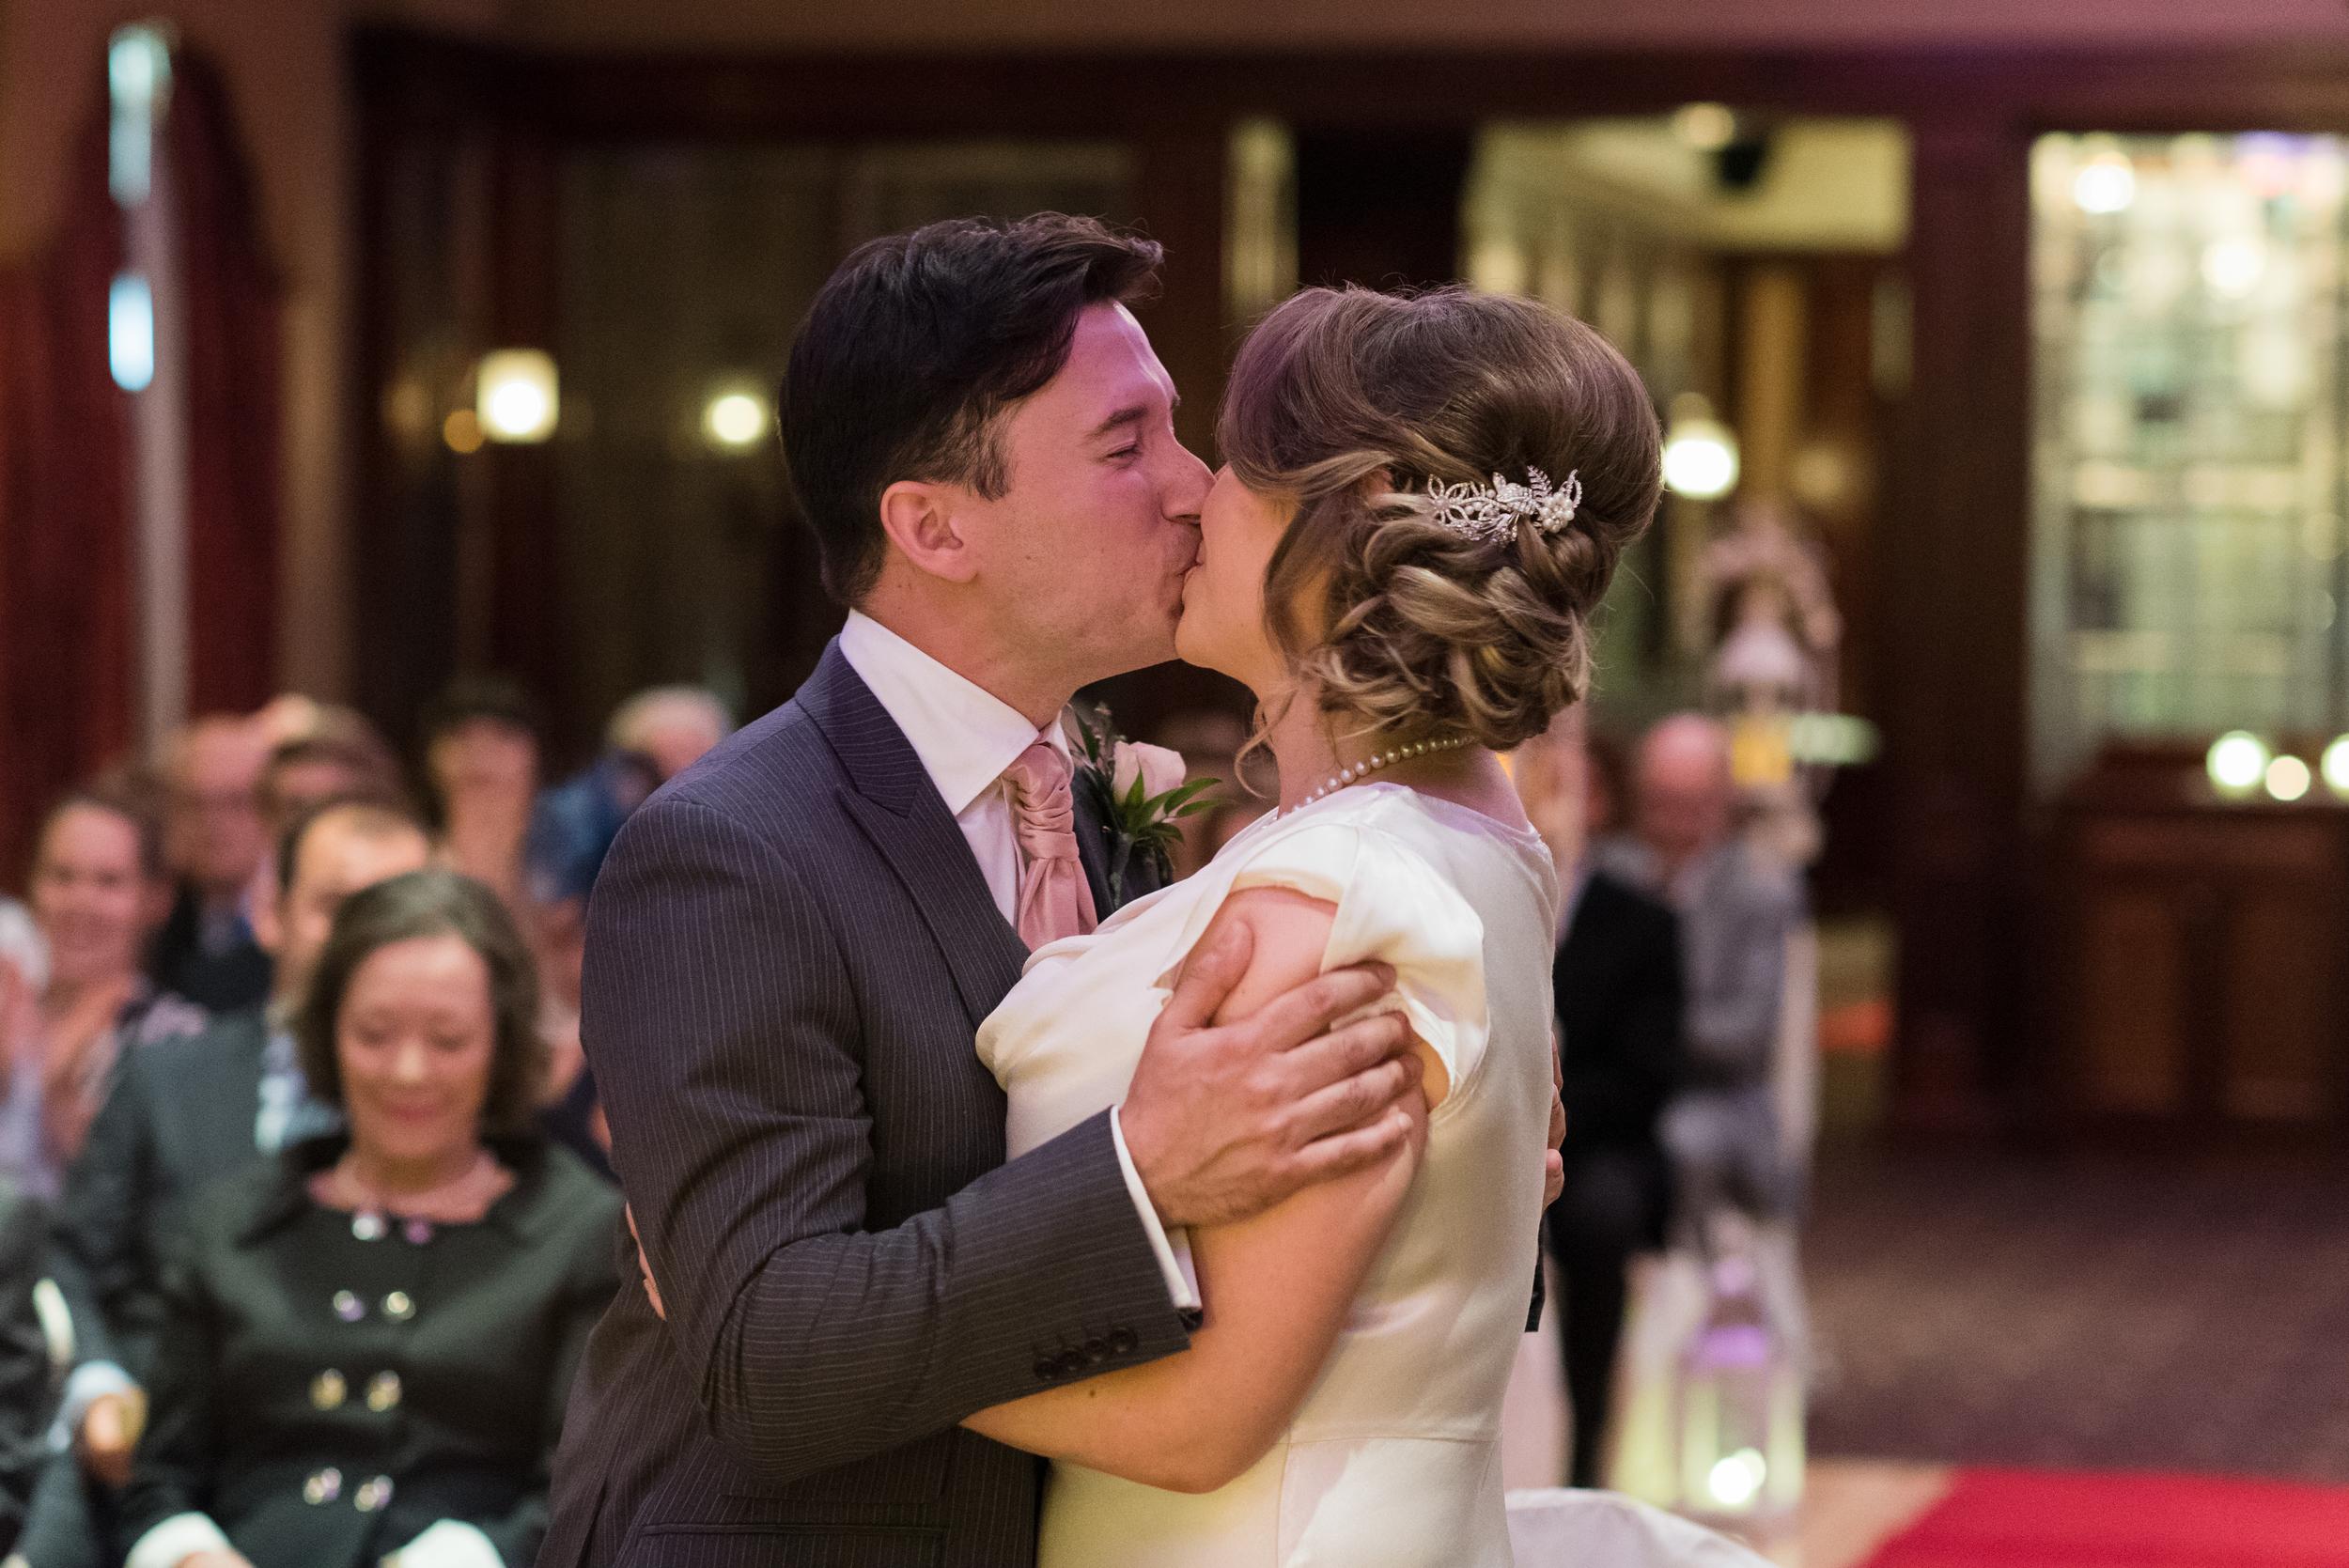 Canal Court Hotel Newry Wedding photographer Pure Photo N.I ceremony bride groom kiss